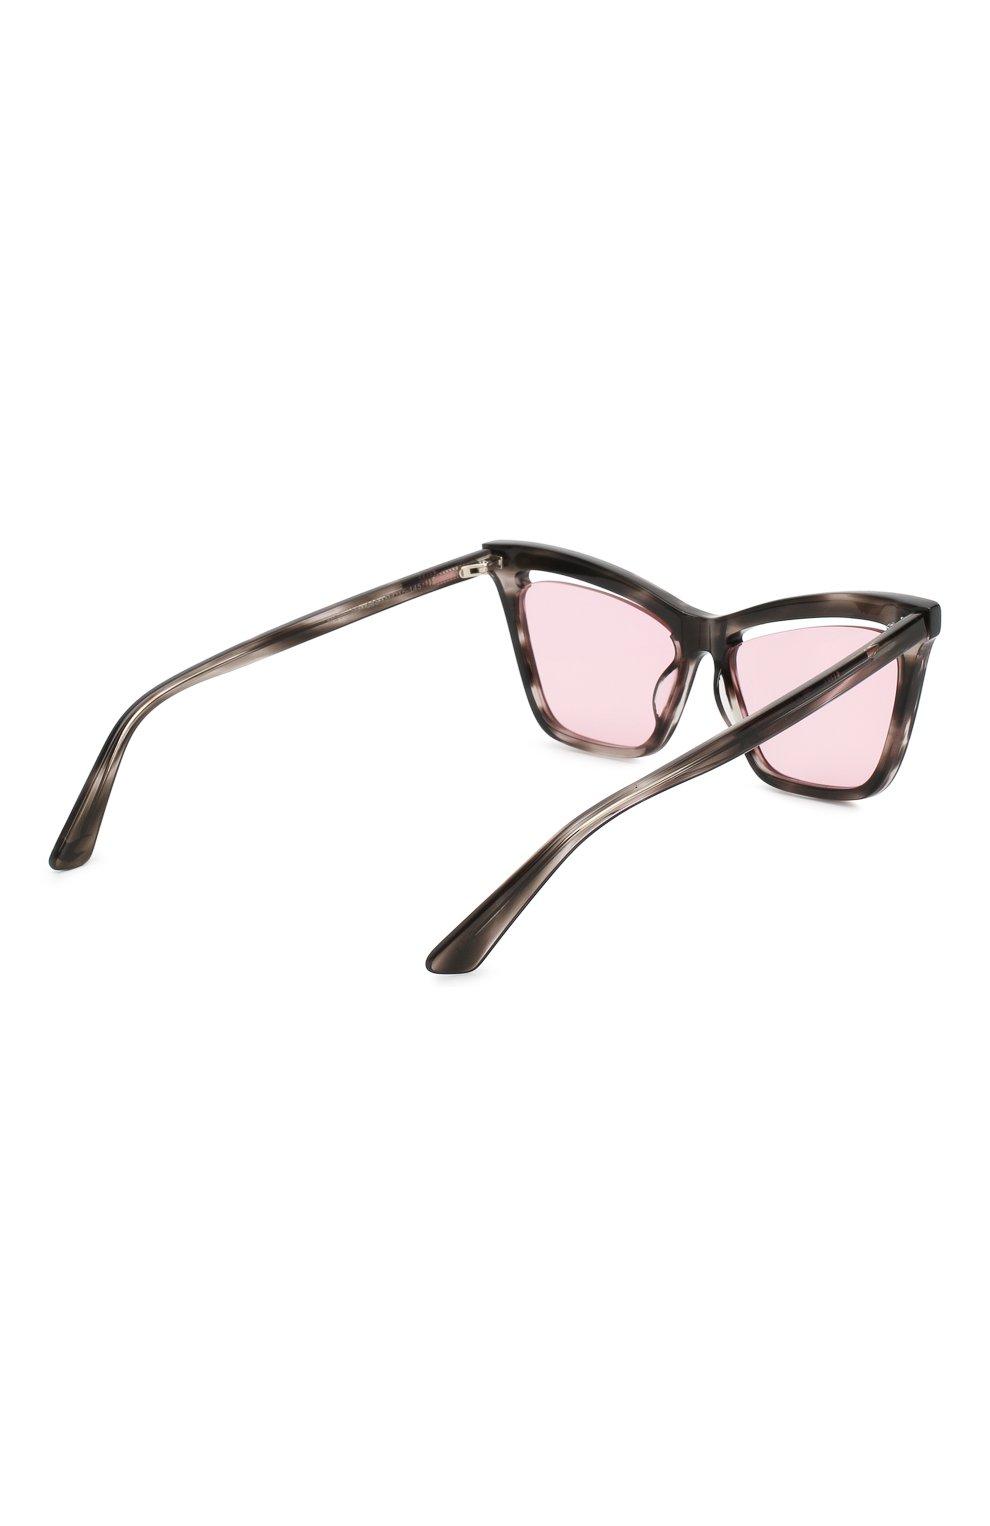 Женские солнцезащитные очки MCQ SWALLOW розового цвета, арт. MQ0156 003 | Фото 4 (Тип очков: С/з; Статус проверки: Проверено, Проверена категория; Оптика Гендер: оптика-женское; Очки форма: Cat-eye)